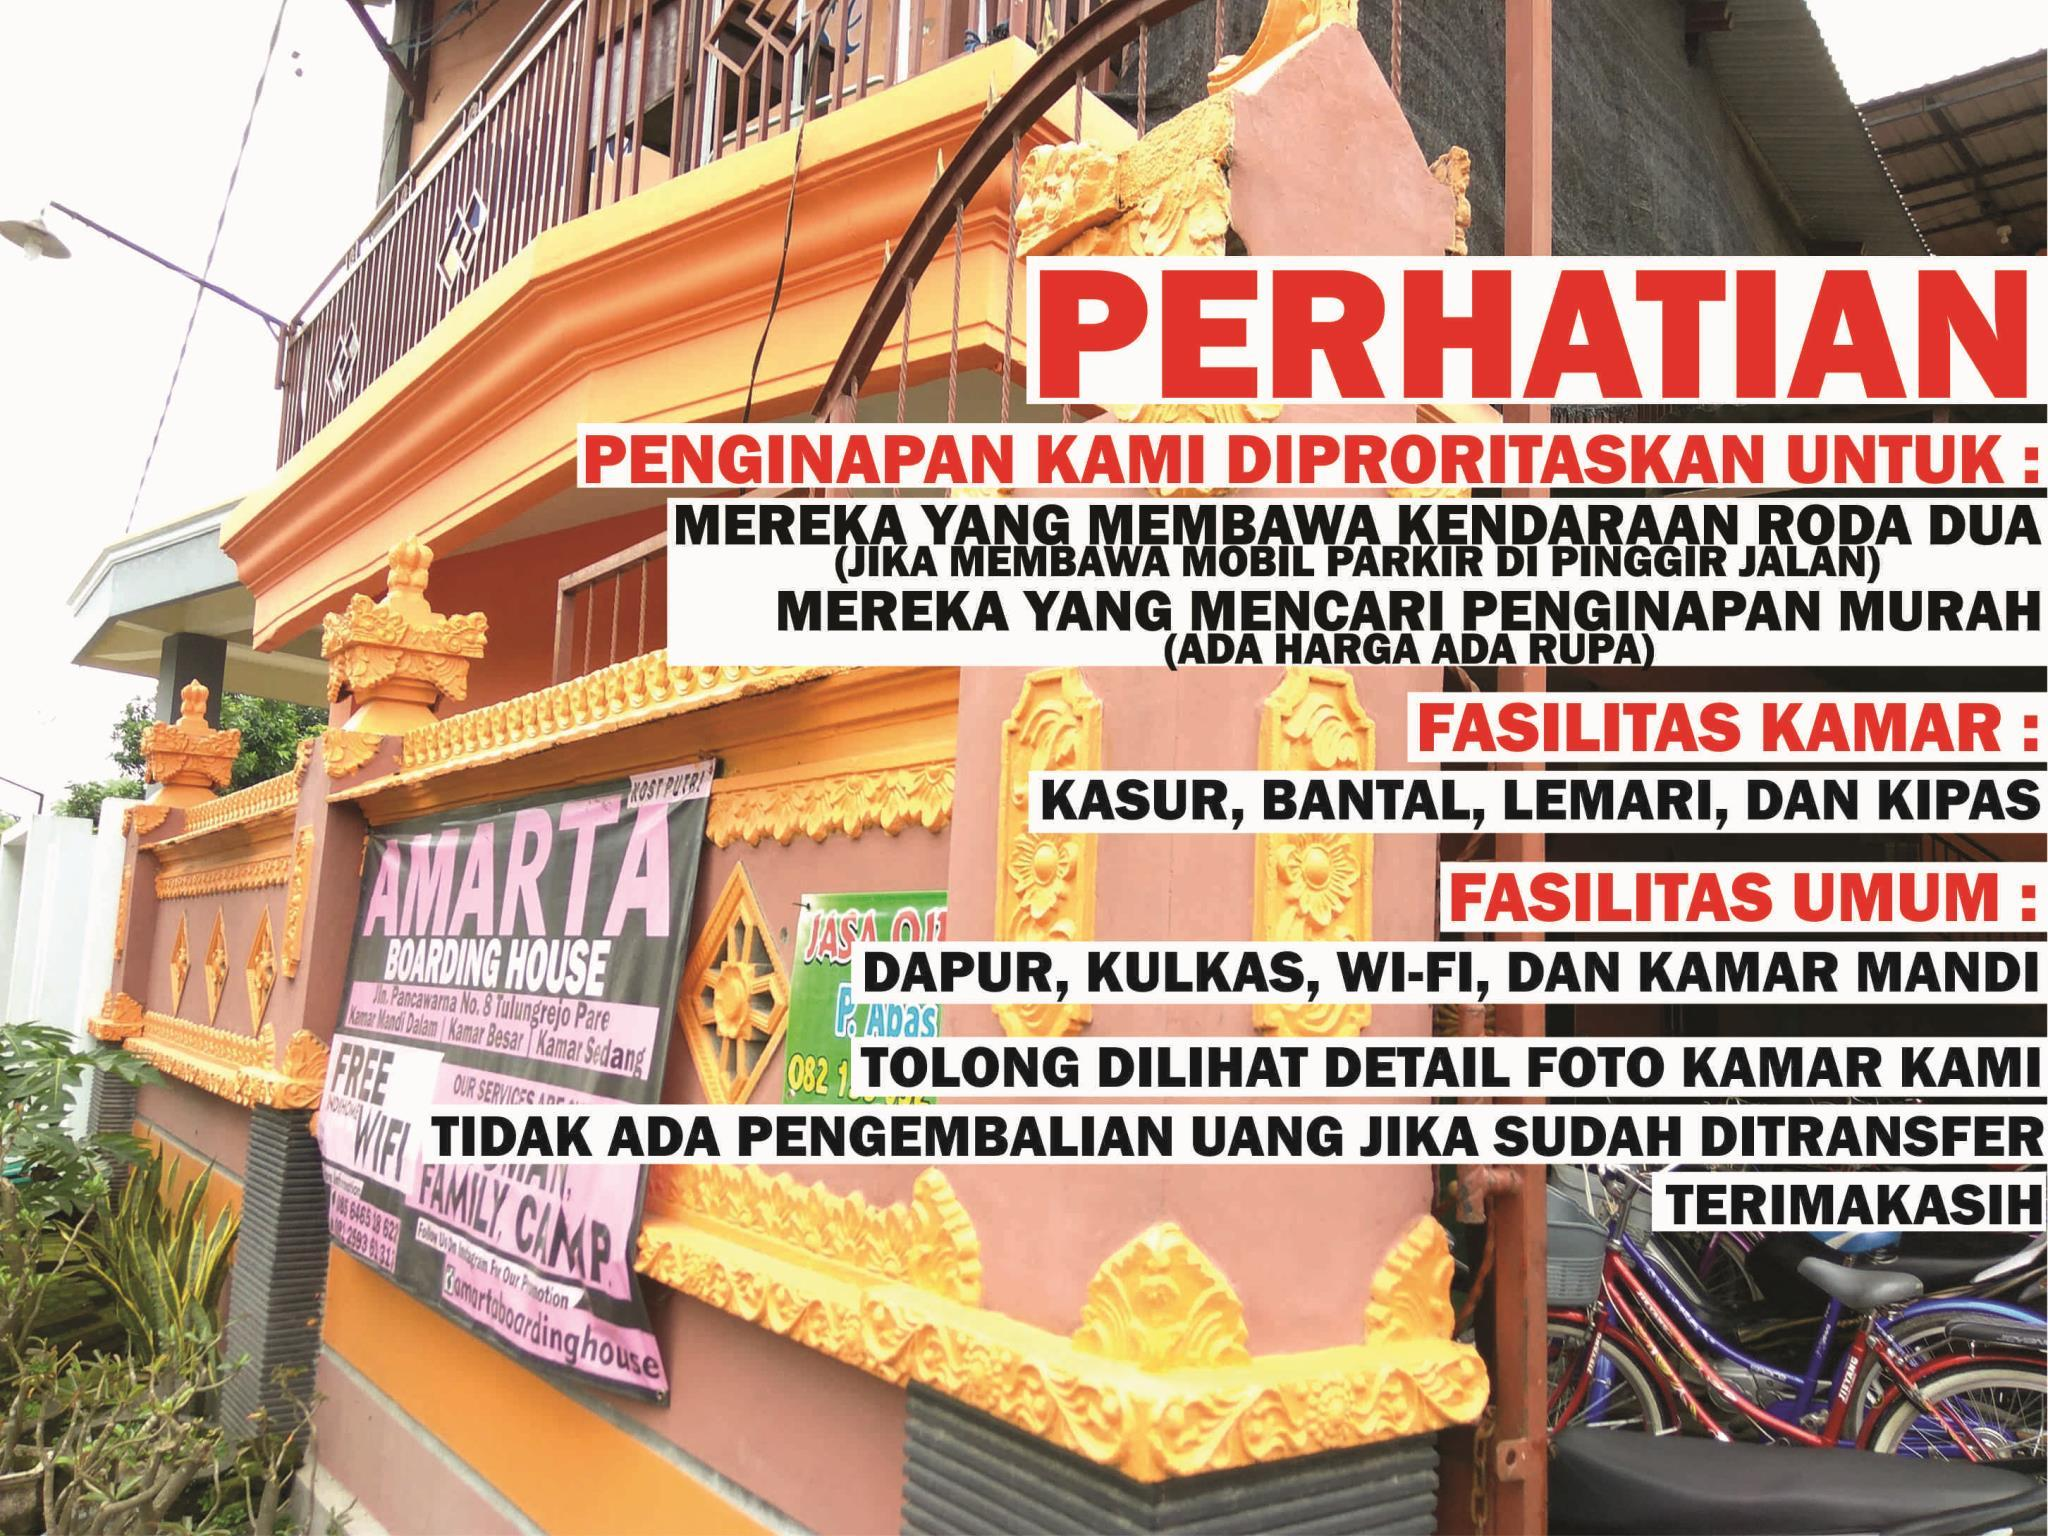 Amarta Boarding House, Kediri